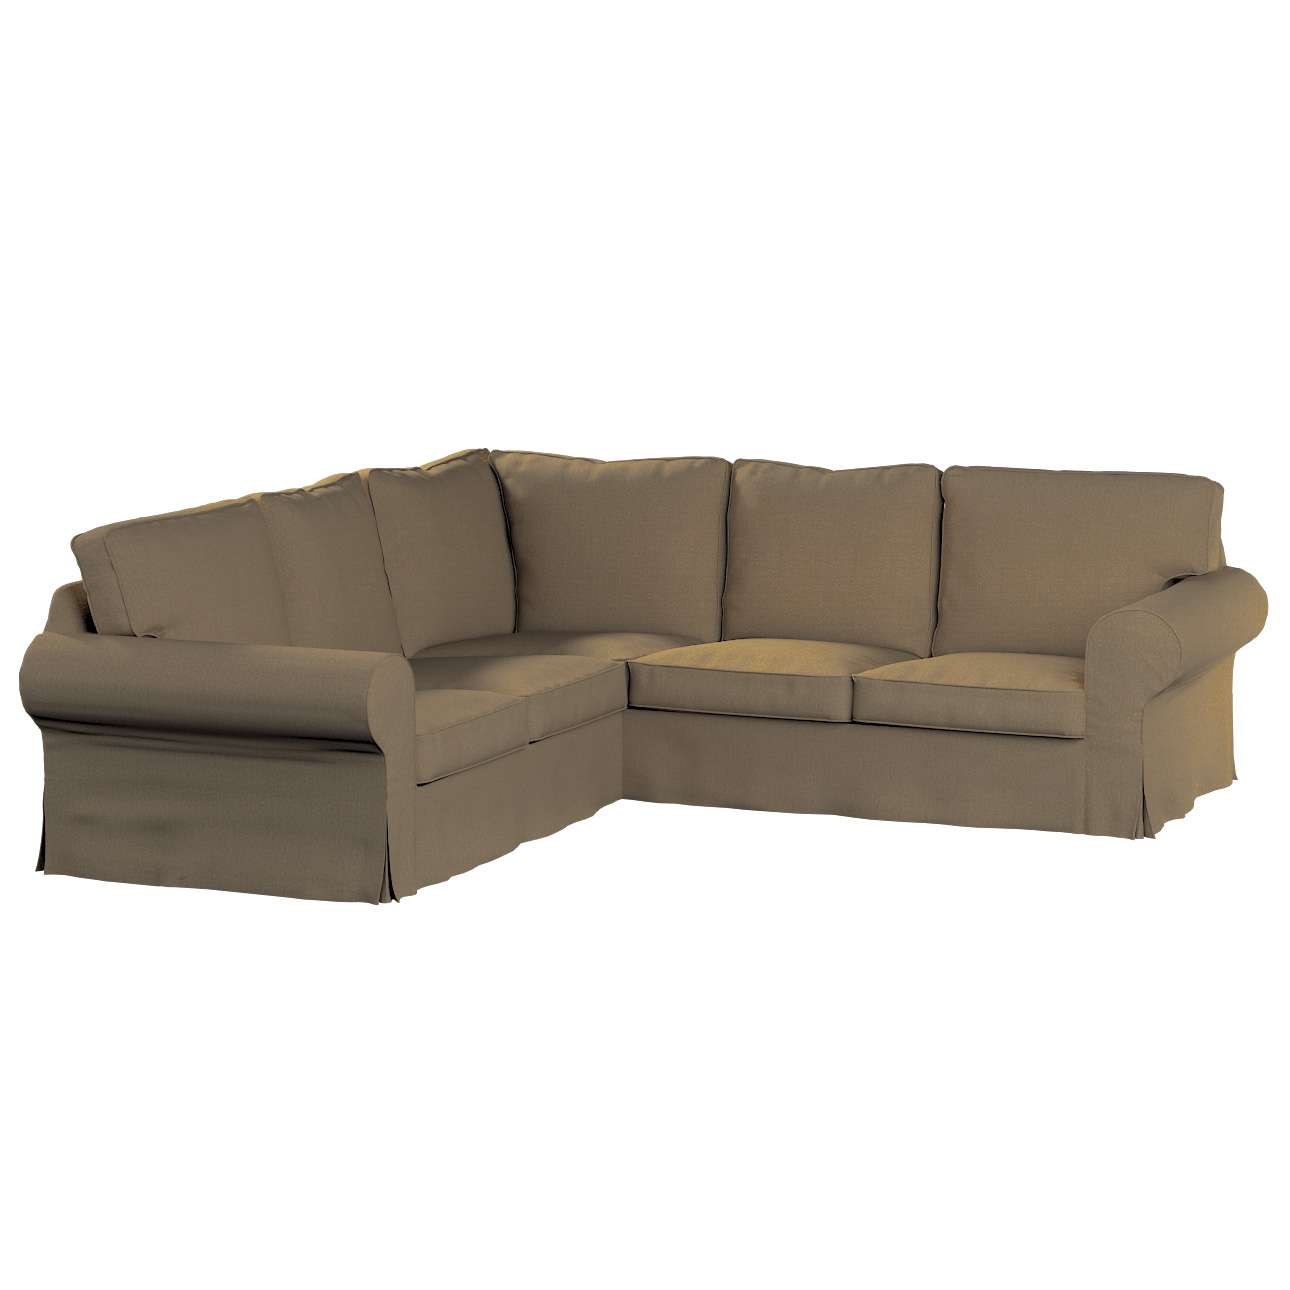 Ektorp kampinė sofa Ektorp kampinė sofa kolekcijoje Chenille, audinys: 702-21